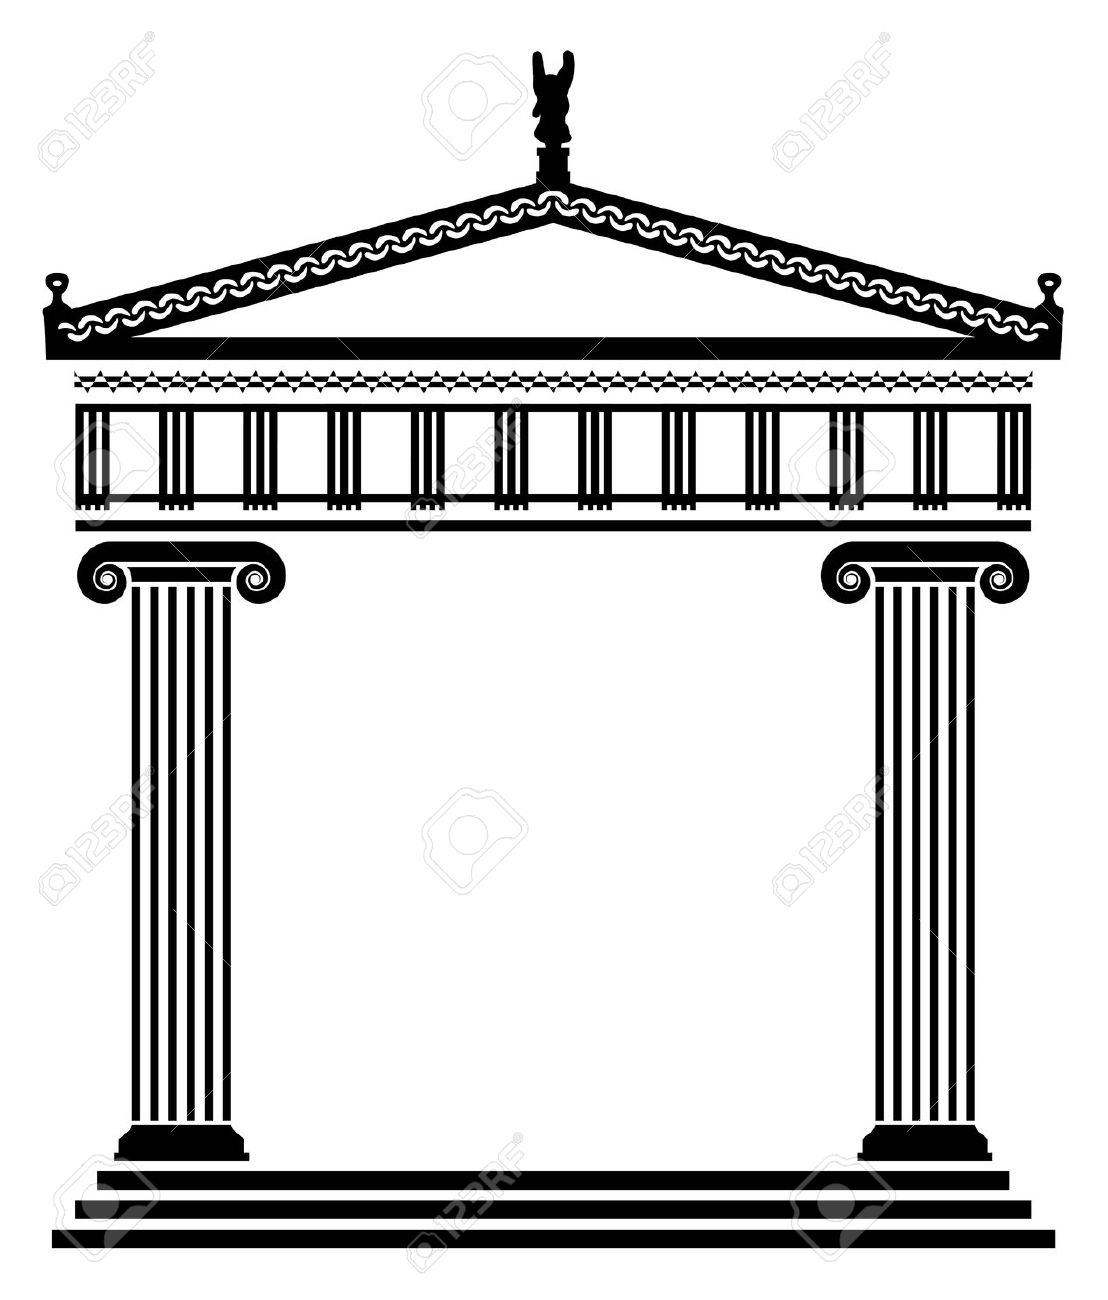 Column clipart roman temple. Free greek cliparts download